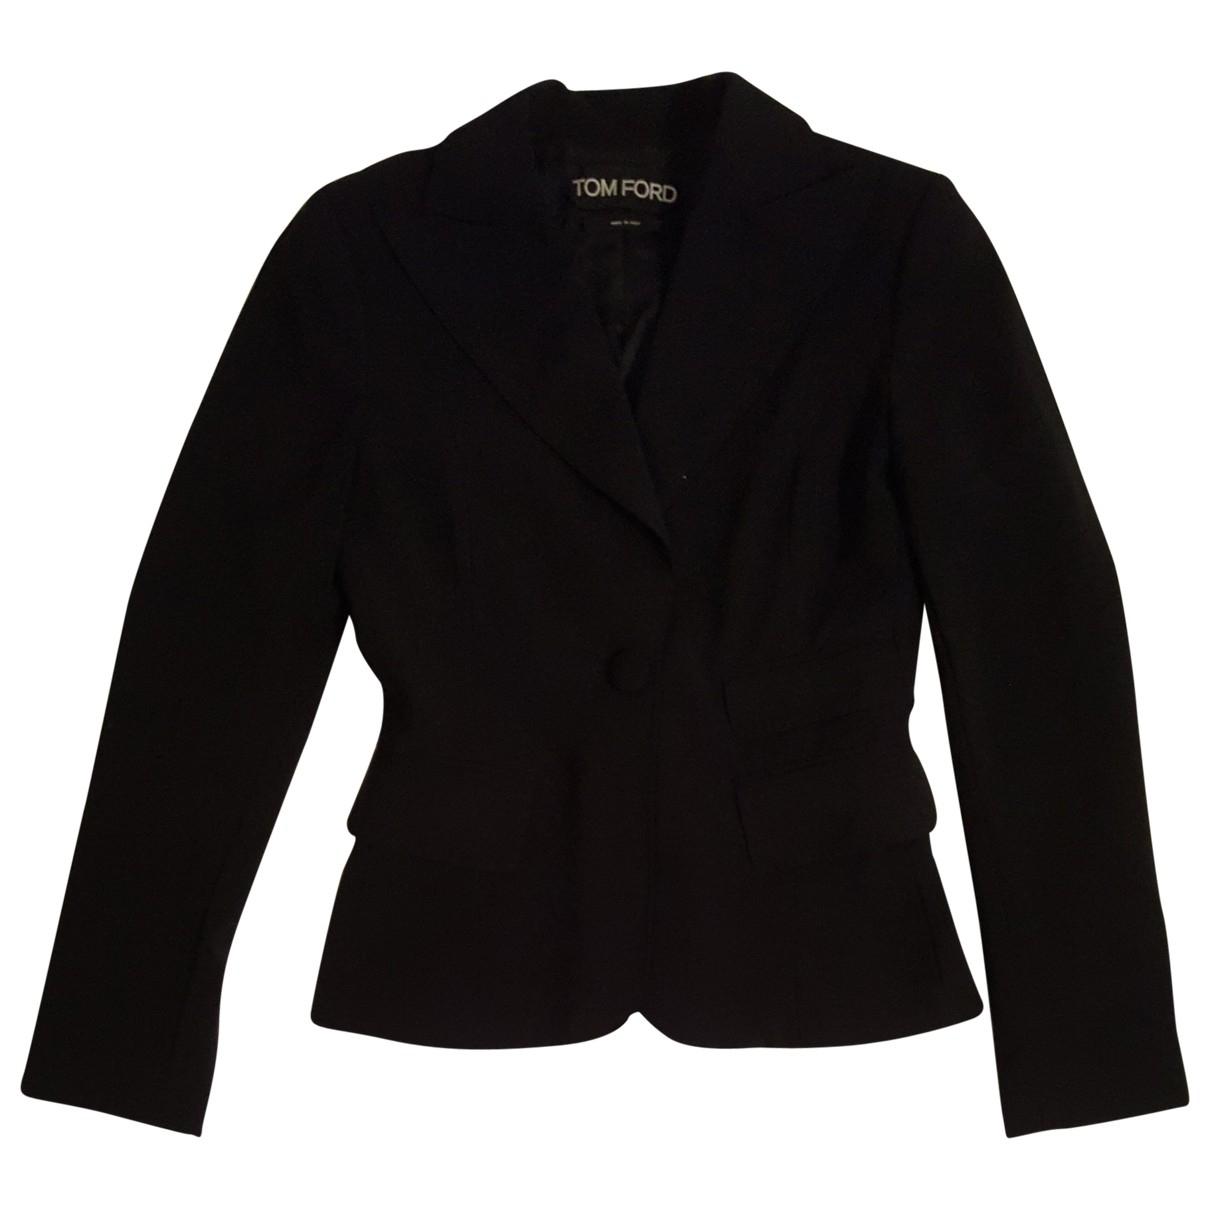 Tom Ford \N Jacke in  Schwarz Polyester